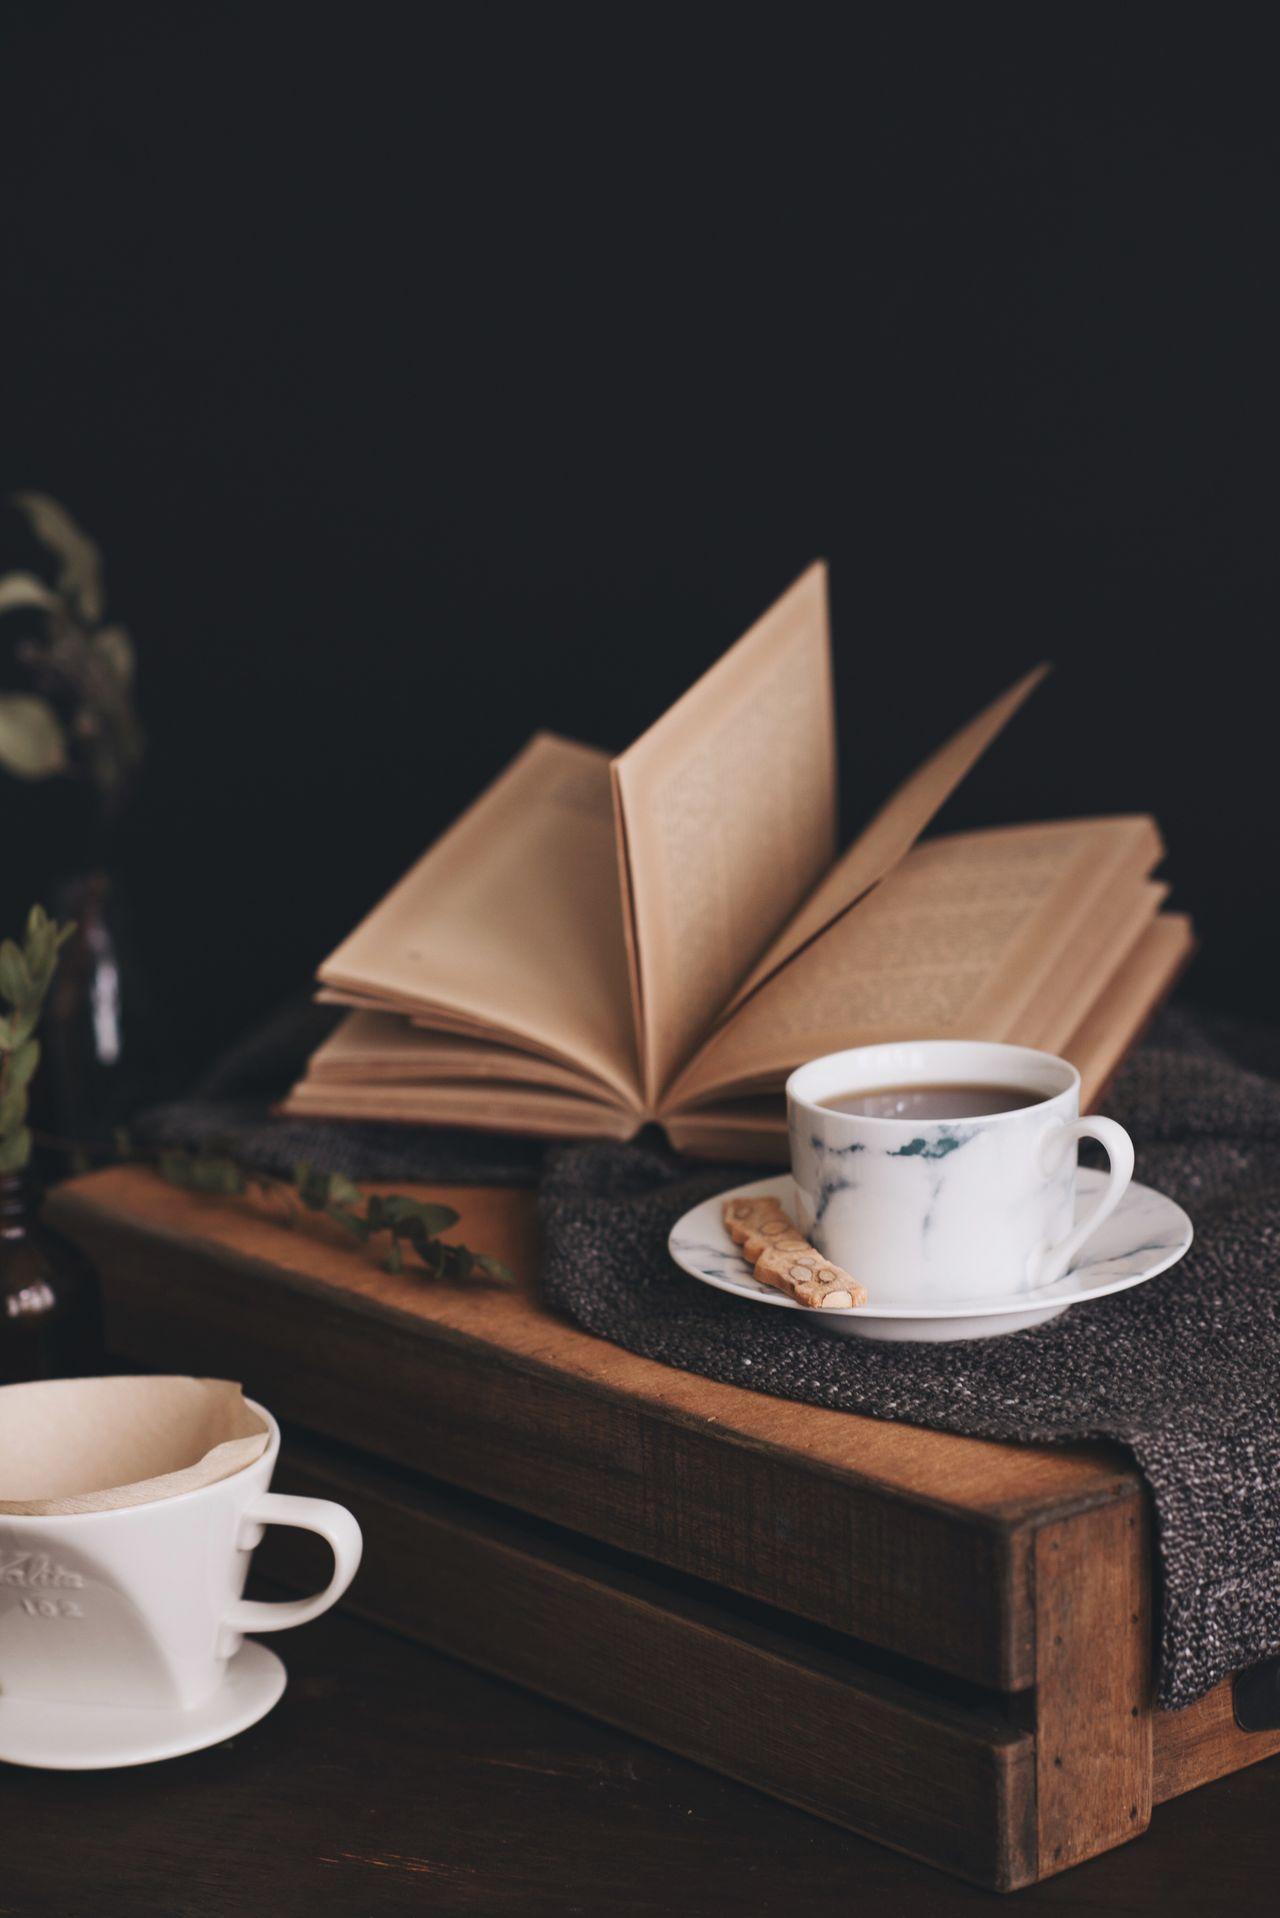 Cozy Cozycorner Alone Time Books Coffee Pursuepretty Mornings Morningslikethese